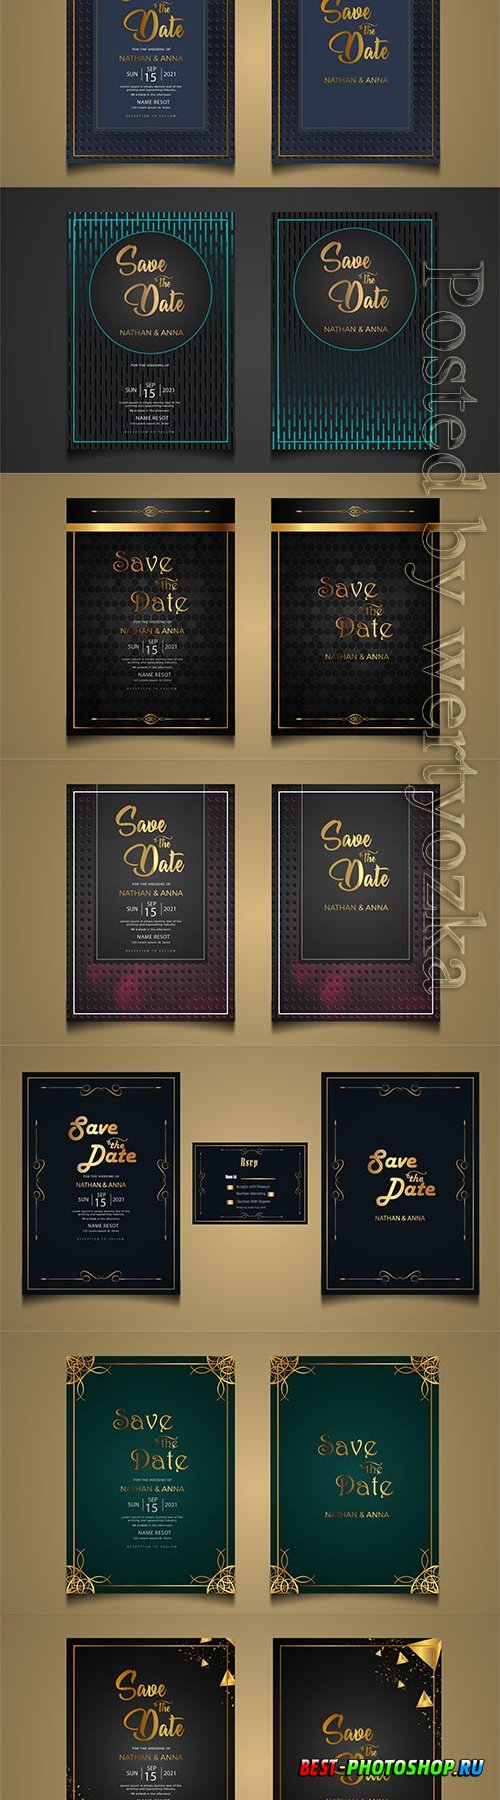 Set collection luxury modern wedding invitation vector card template